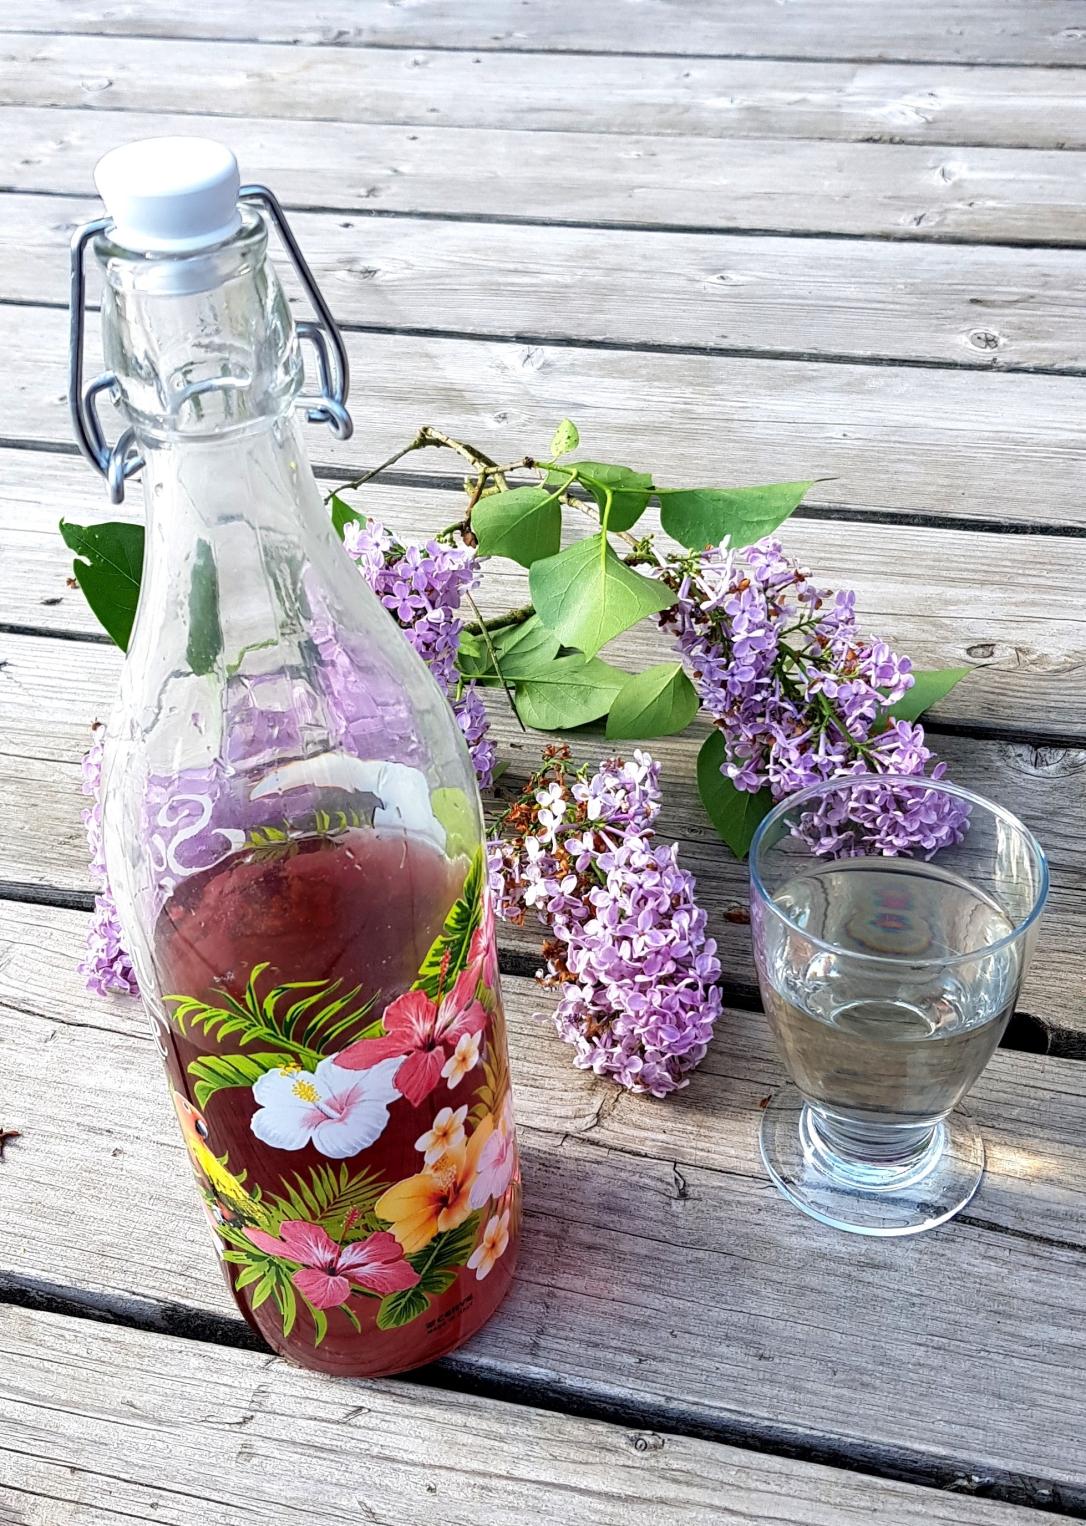 sirop-de-fleurs-de-lilas.jpg